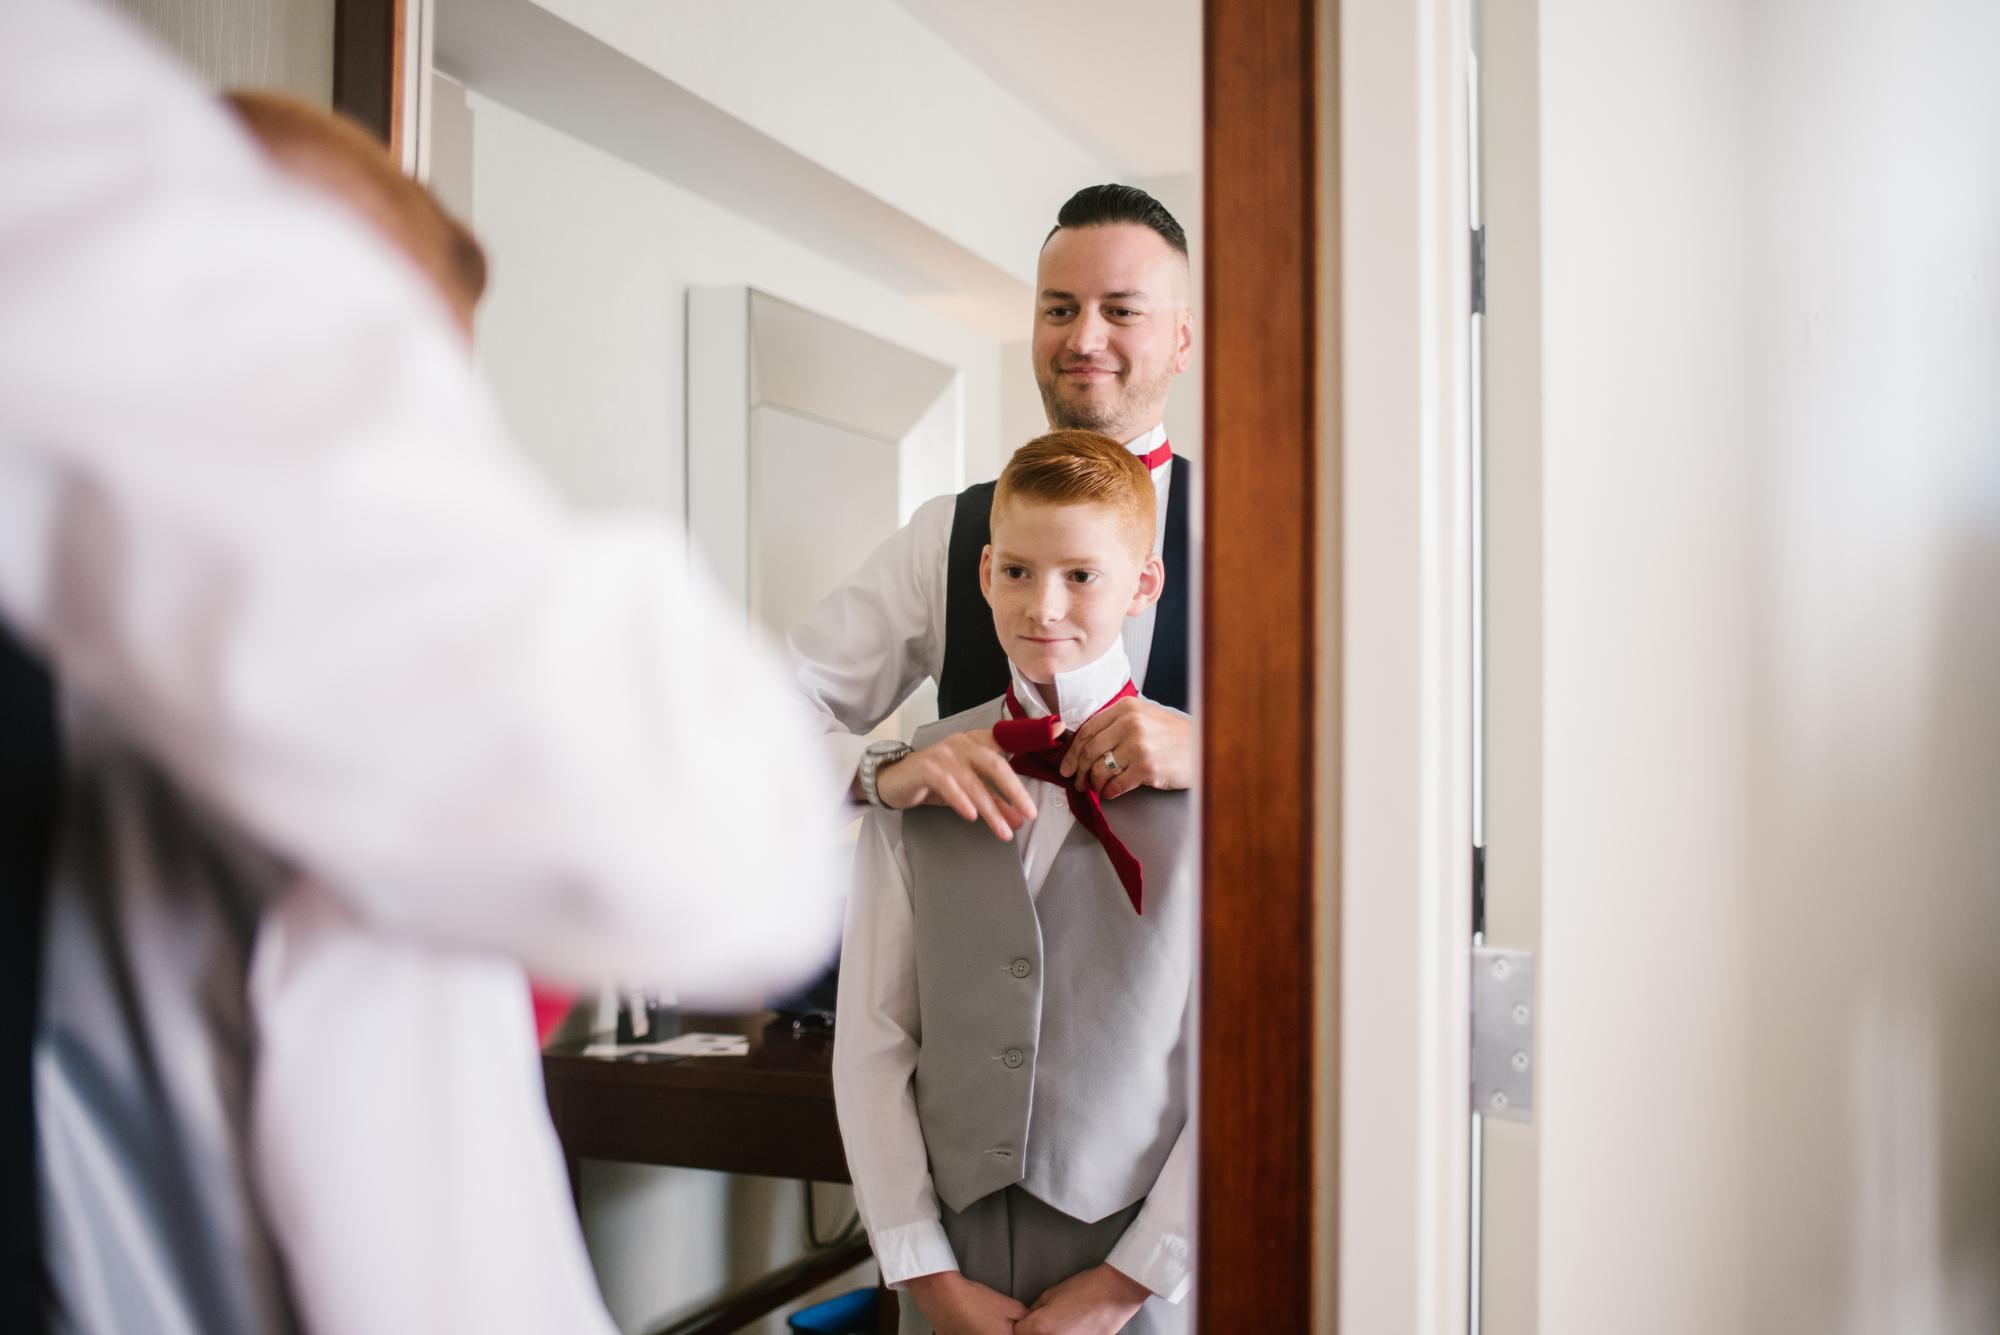 detroit-michigan-westin-book-cadillac-groomsmen-getting-ready-sydney-marie-photography (1).jpg